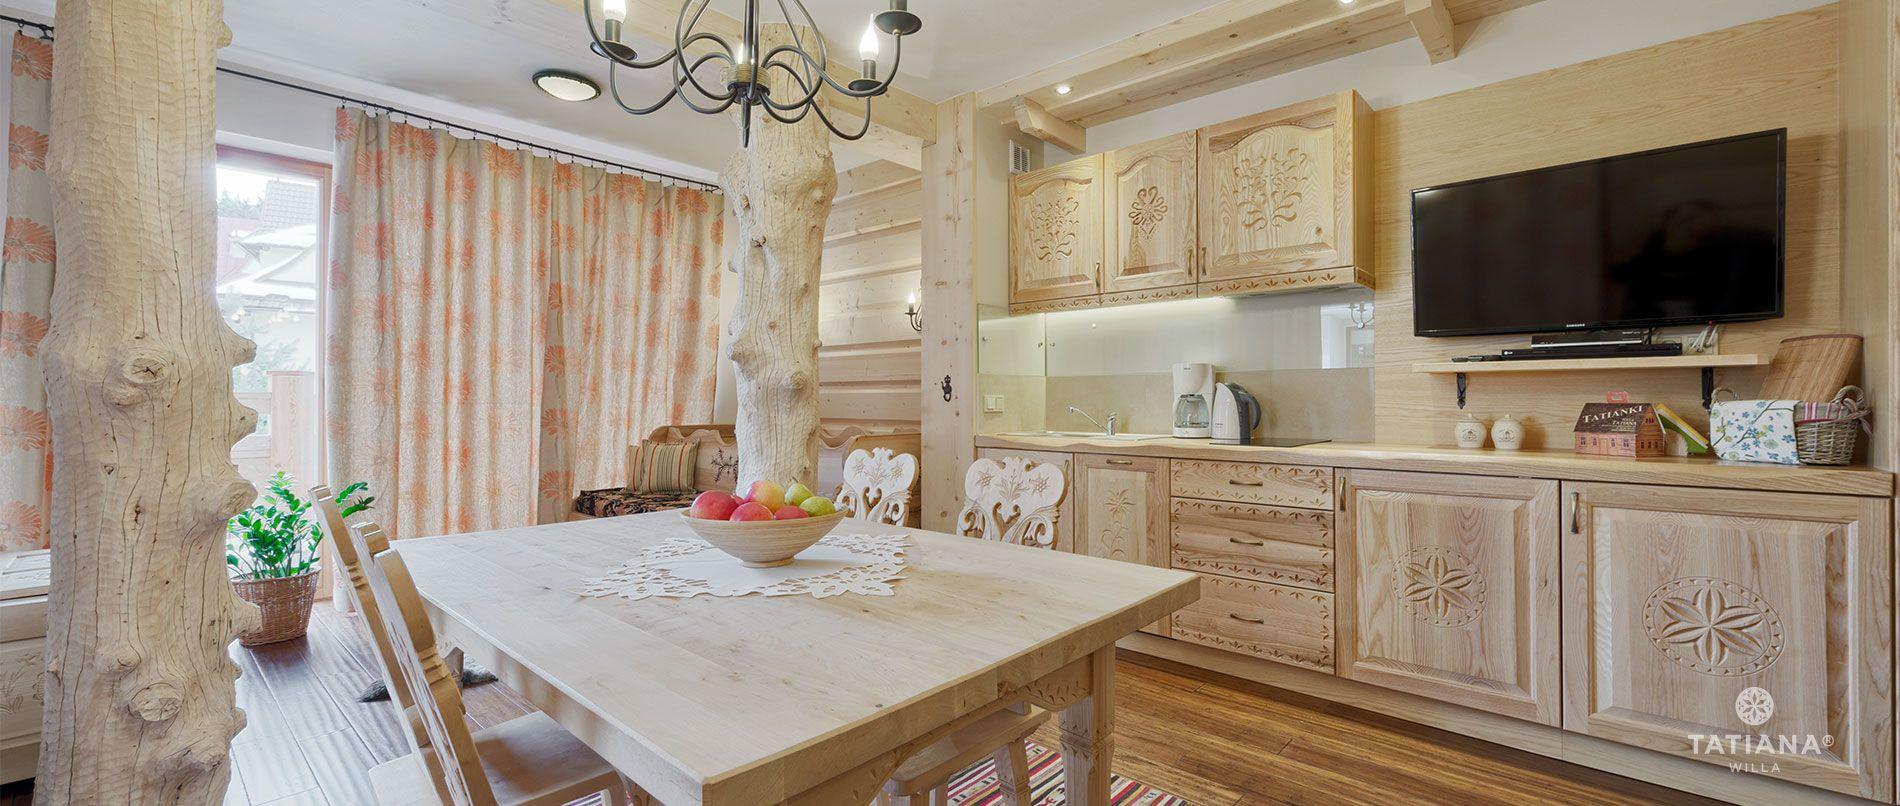 Apartament Lux11- aneks kuchenny